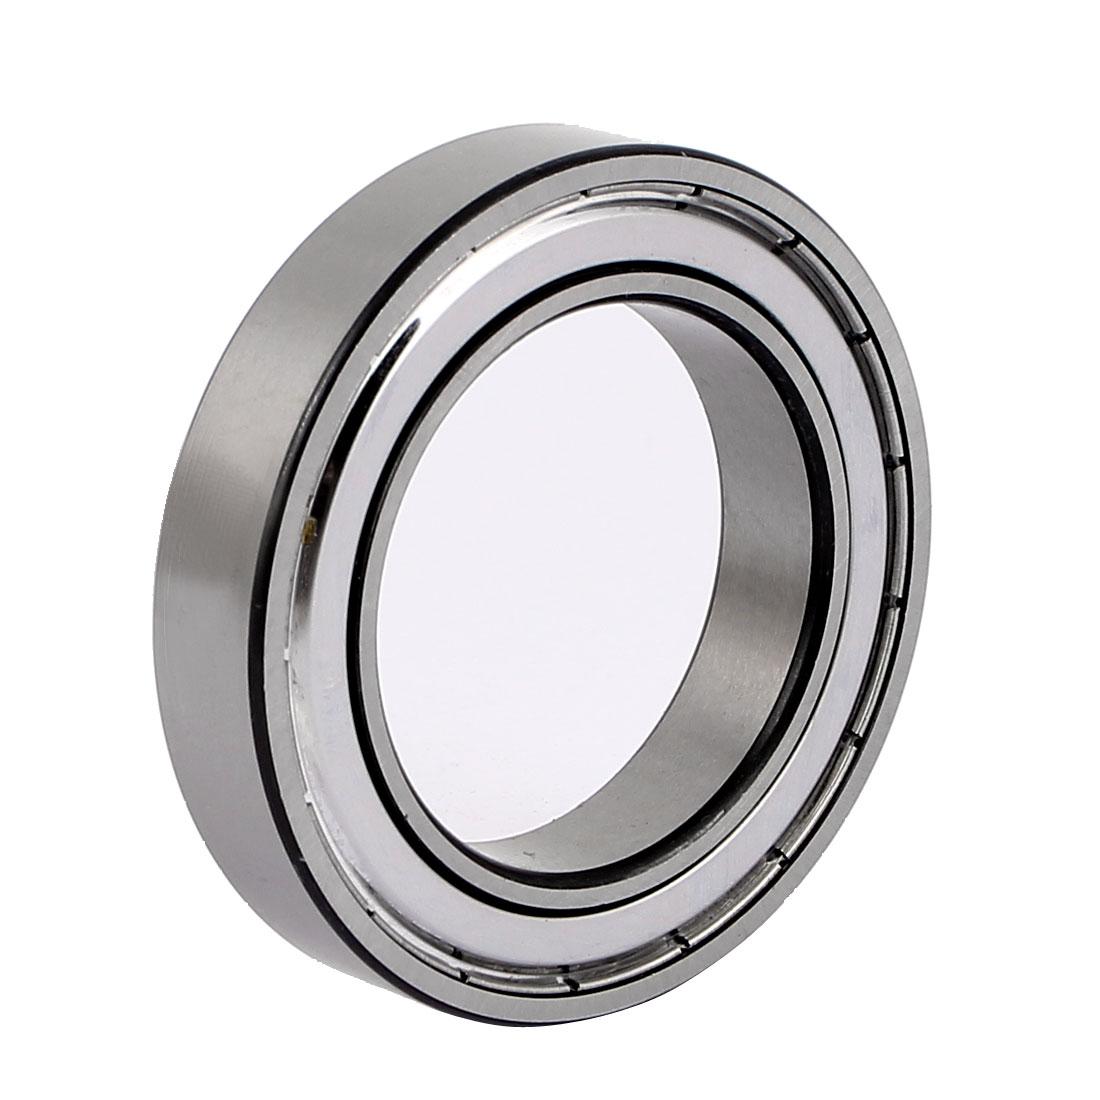 ZZ6908 62mmx40mmx12mm Single Row Deep Groove Shielded Ball Bearing